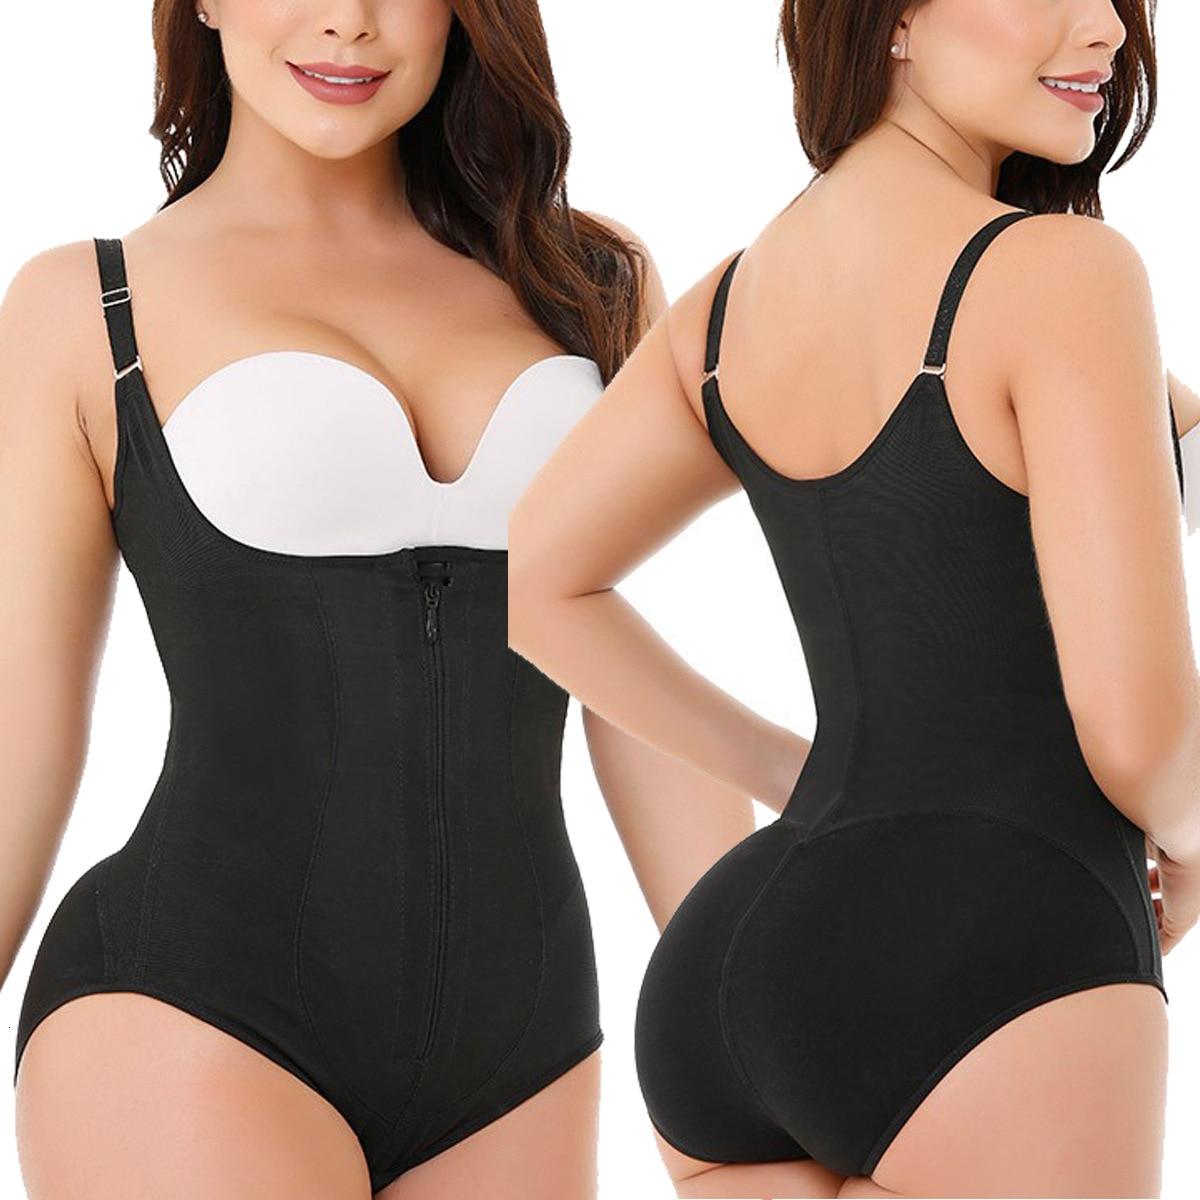 Bodysuit Shapewear Women Latex Waist Trainer Slim Zipper And Hook Shapewear Open Bust Corset Tummy Control Shaper TrimmerBodysuits   -